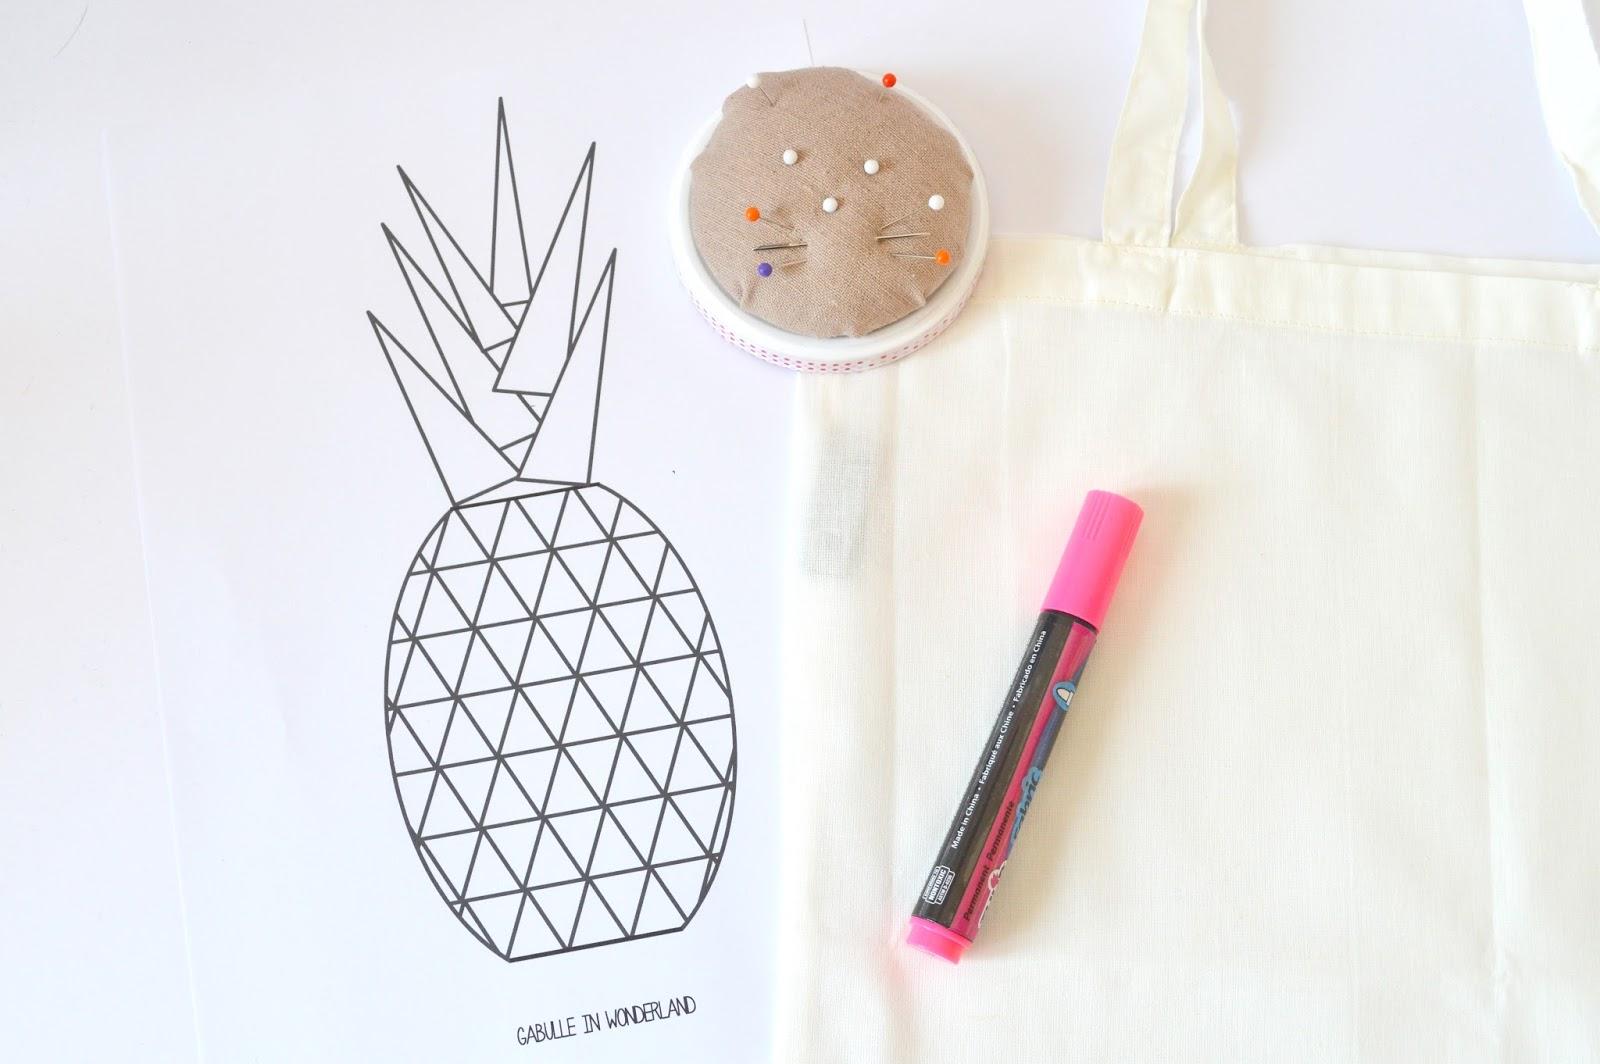 gabulle in wonderland tote bag ananas. Black Bedroom Furniture Sets. Home Design Ideas